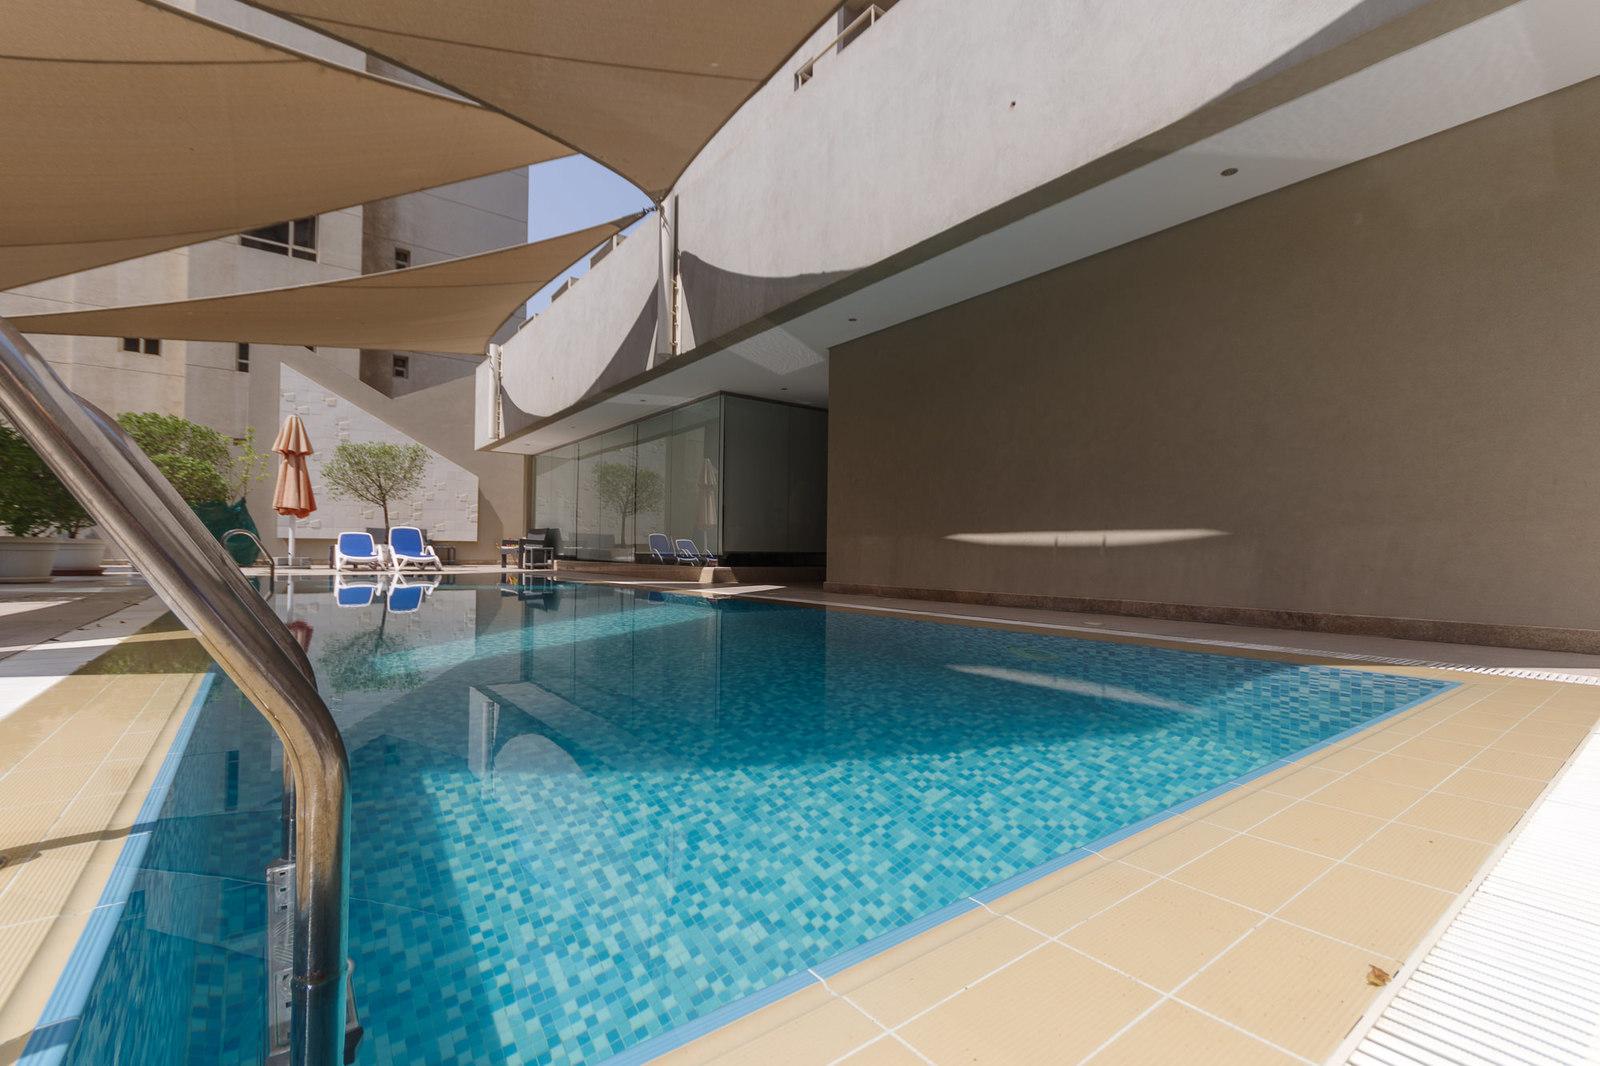 Maidan Hawally – unfurnished, three bedroom apartments w/city views